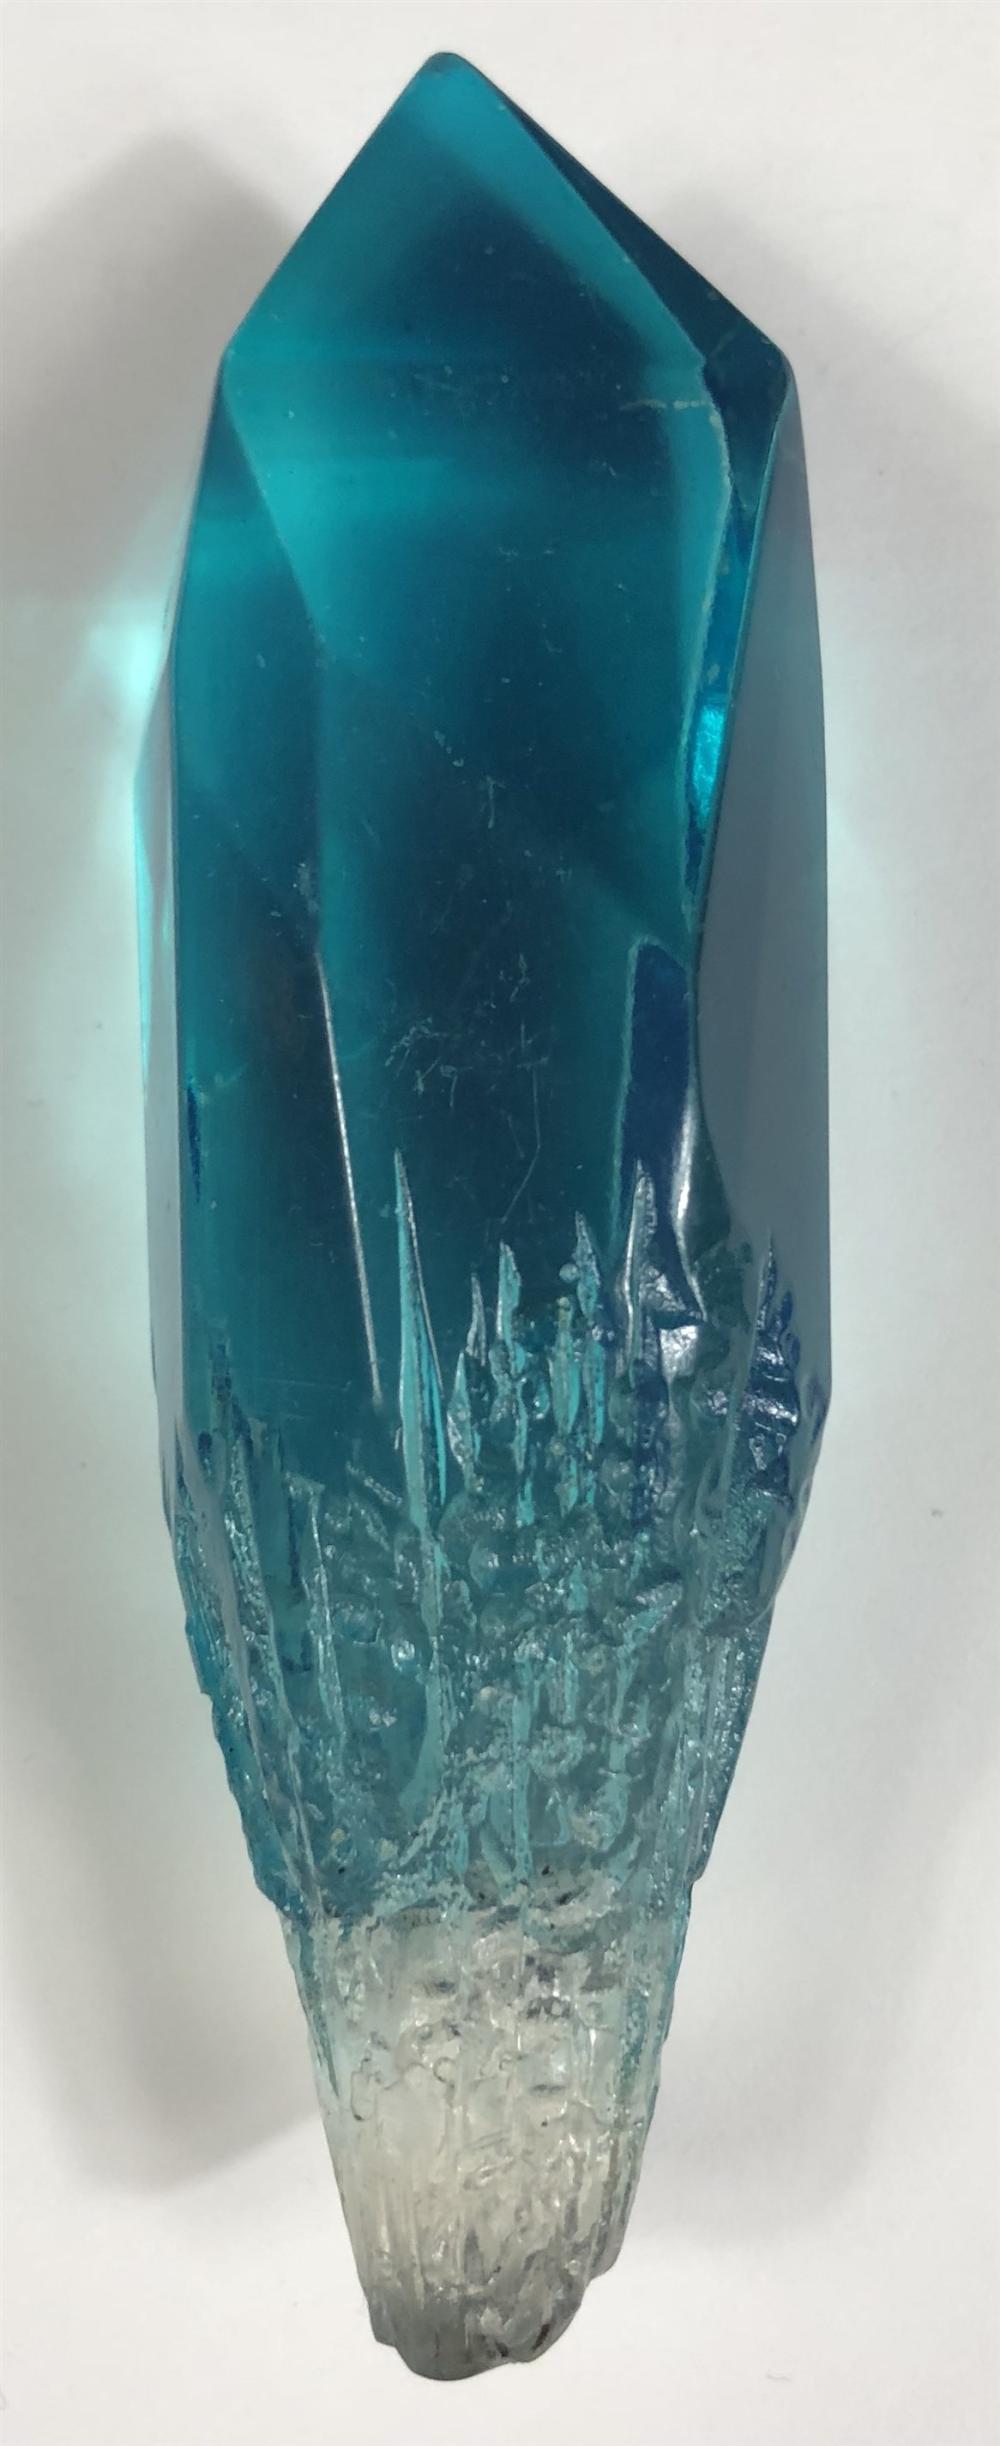 Stargate SG-1 (1997–2007) - Turquoise Tok'ra Crystal